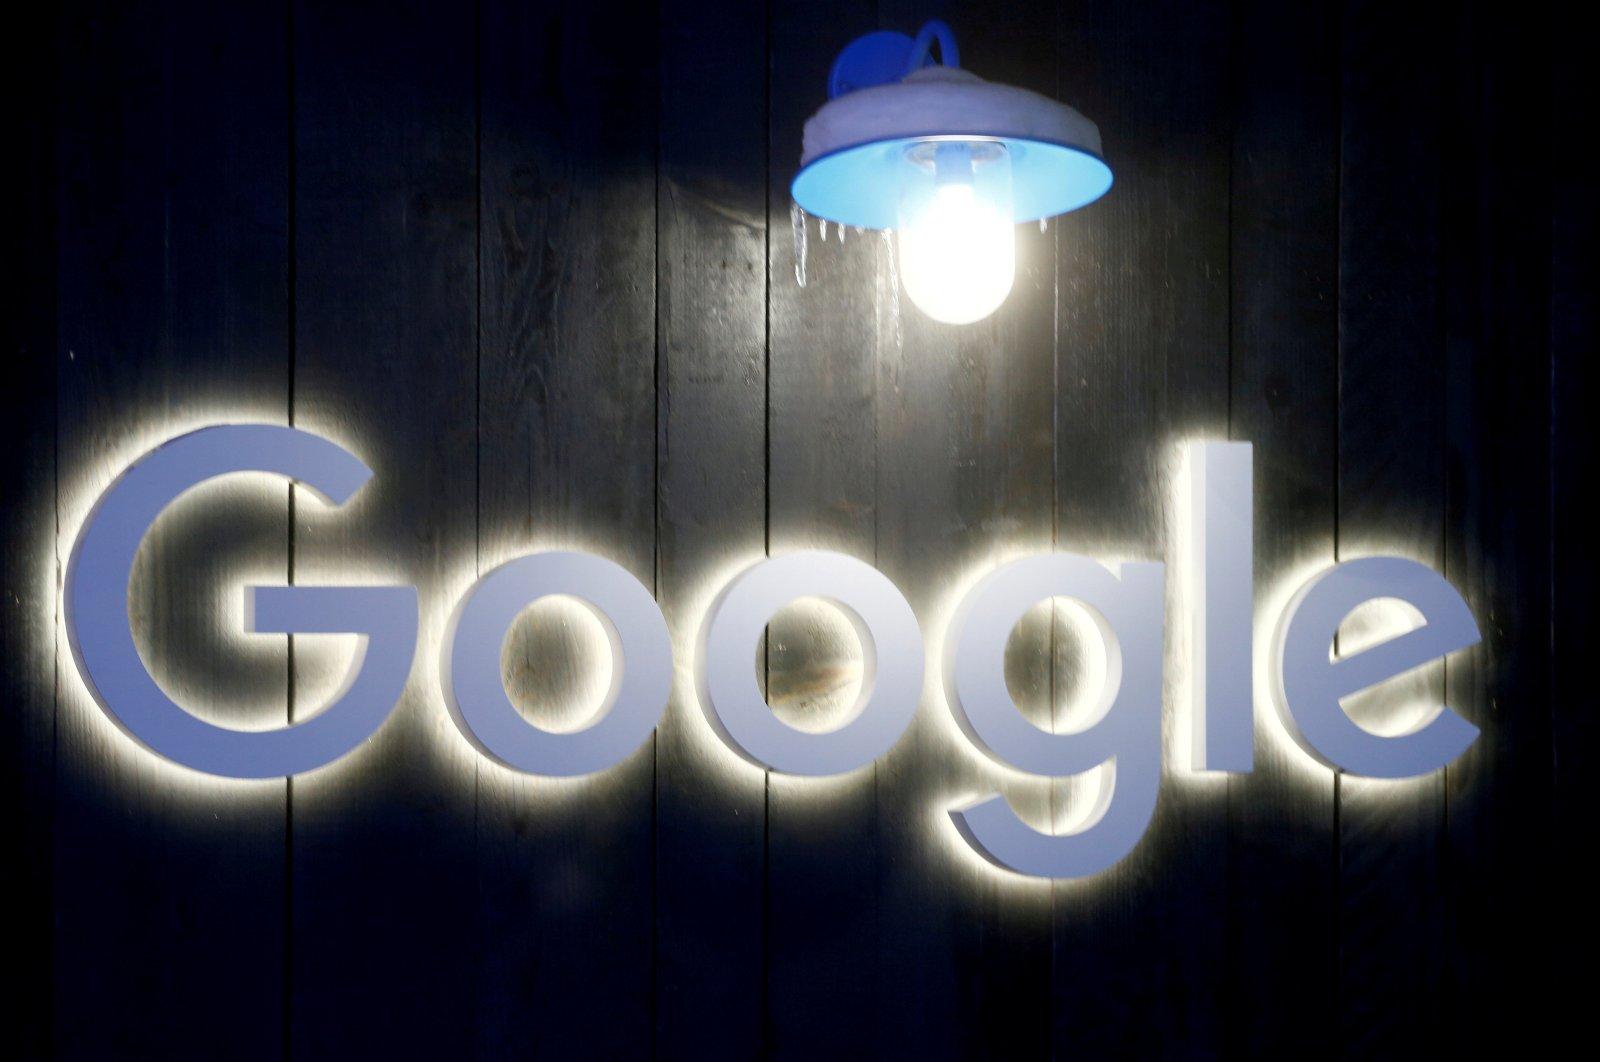 The logo of Google is seen in Davos, Switzerland, Jan. 20, 2020. (Reuters Photo)